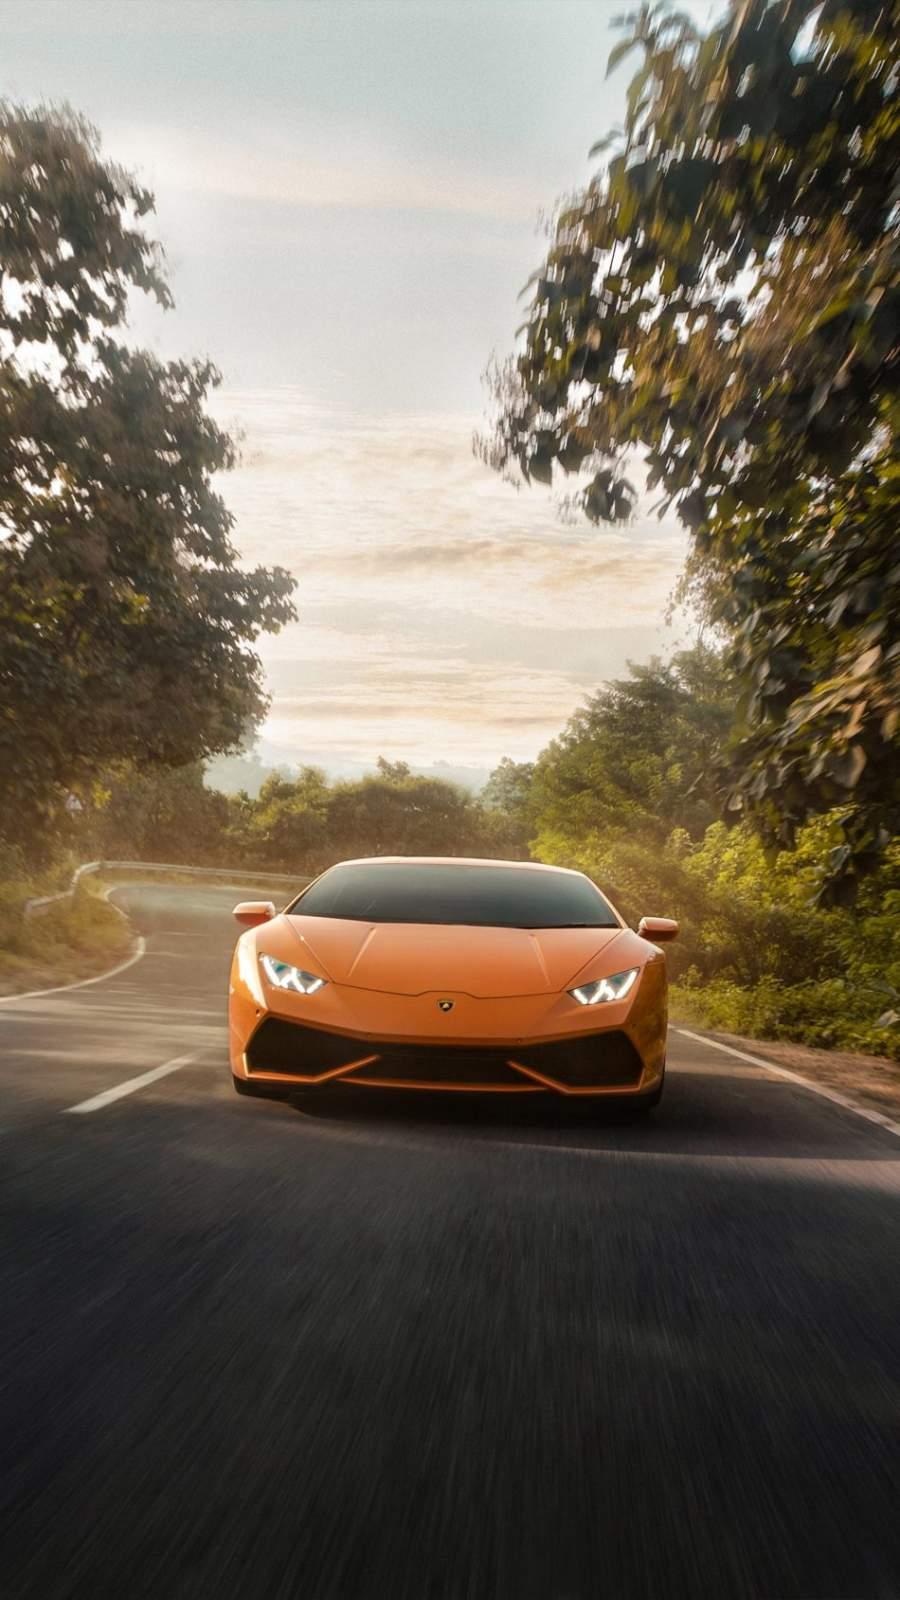 Lamborghini Huracan on Road 4K iPhone Wallpaper